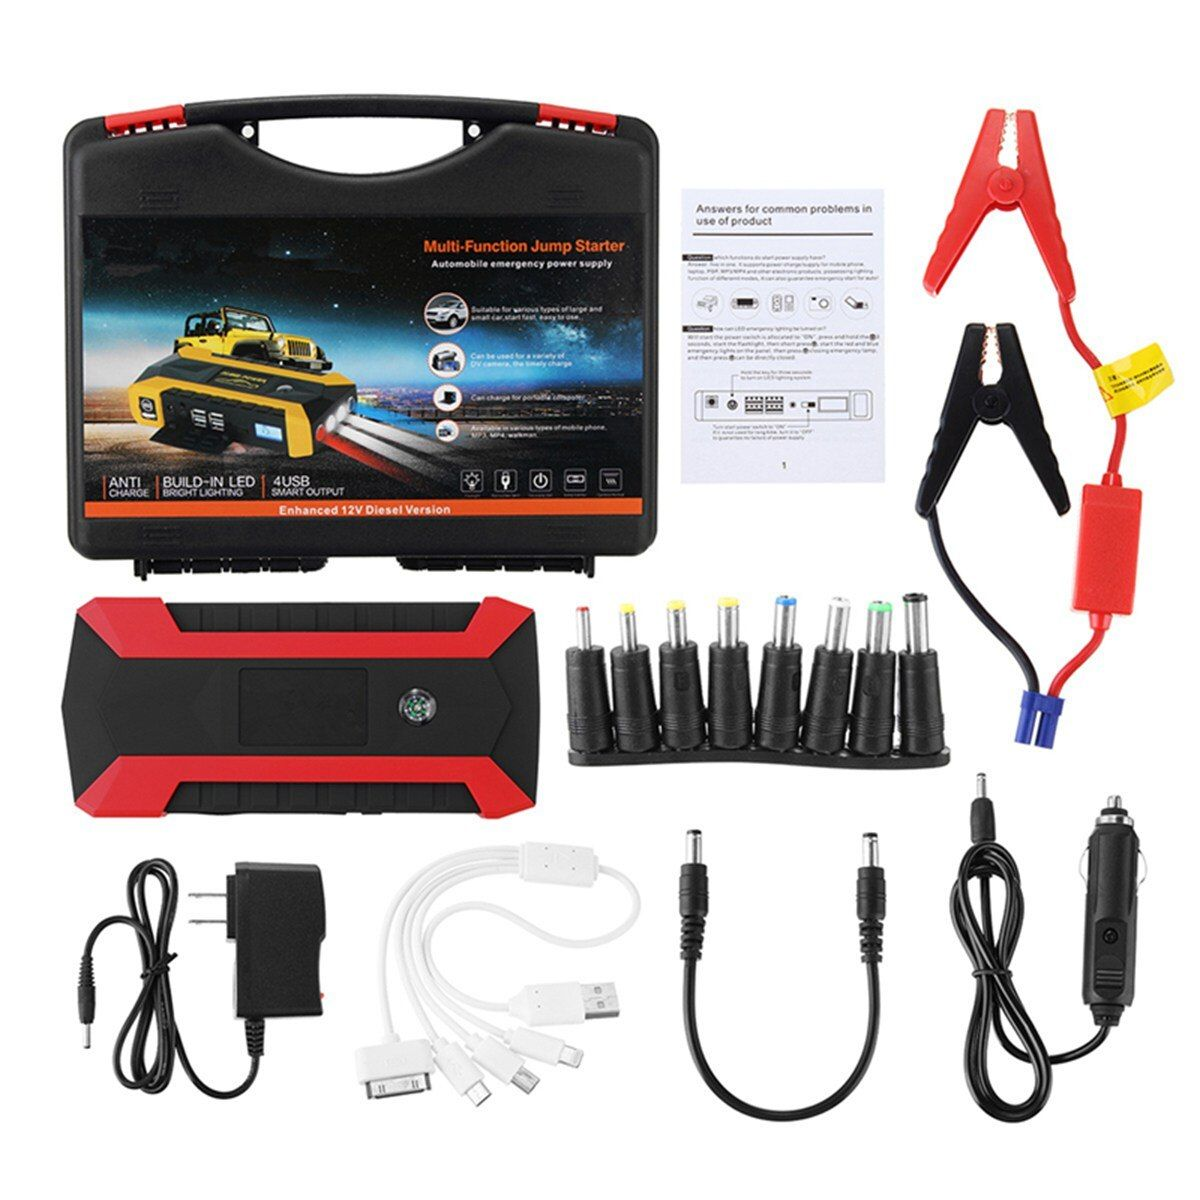 Newest 89800mAh Multifunction 1set Car Charger Battery Jump Starter 4USB LED Light Auto Emergency Mobile Power Bank Tool Kit